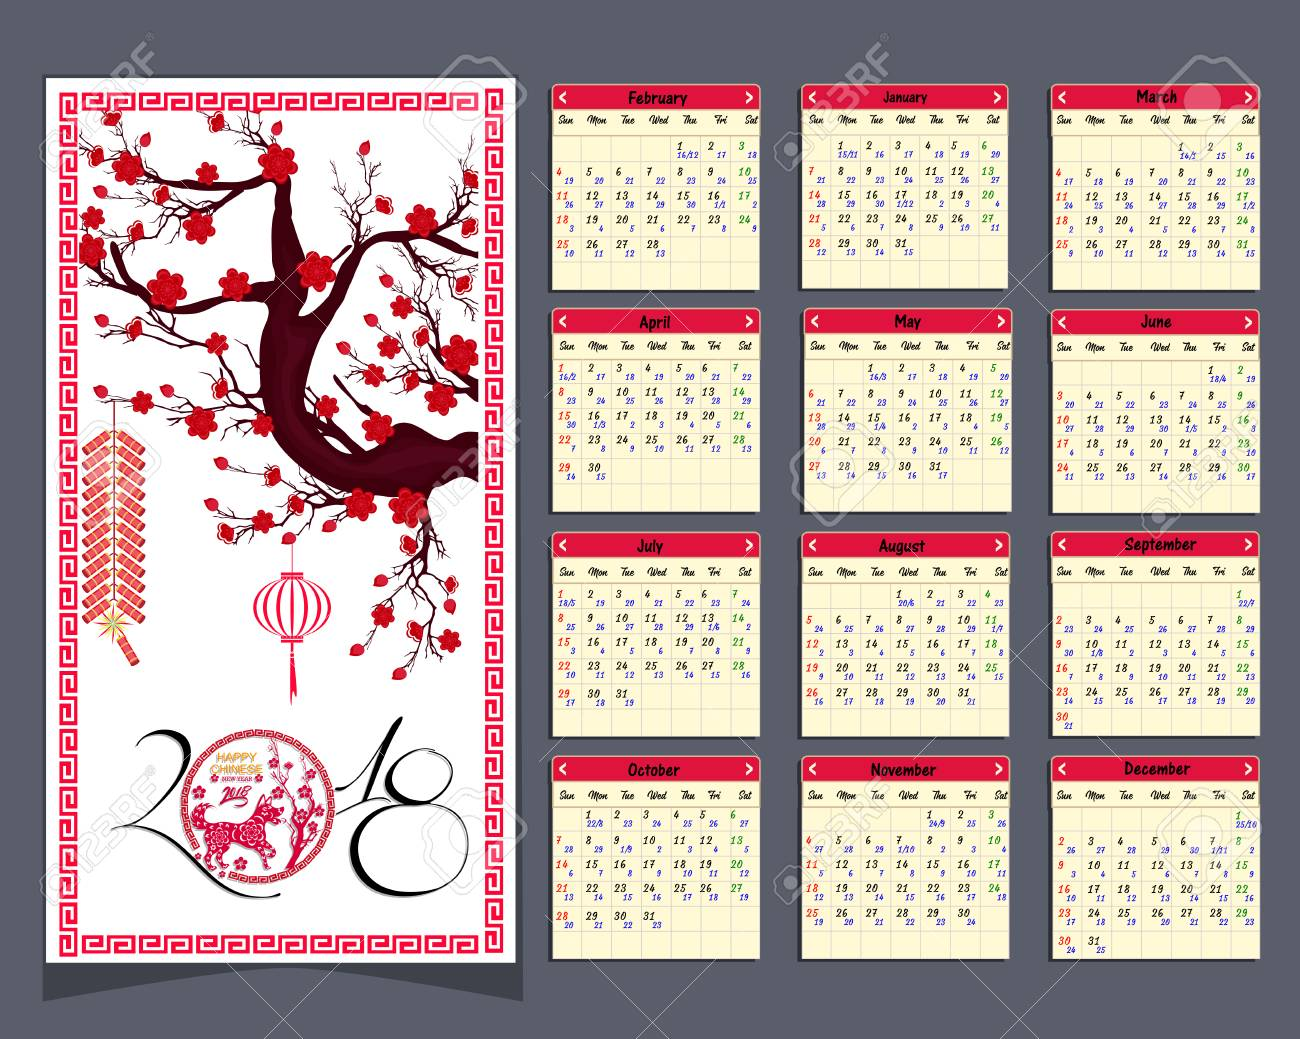 Calendario Chino.Calendario Lunar Calendario Chino Para Feliz Ano Nuevo 2018 Ano Del Perro